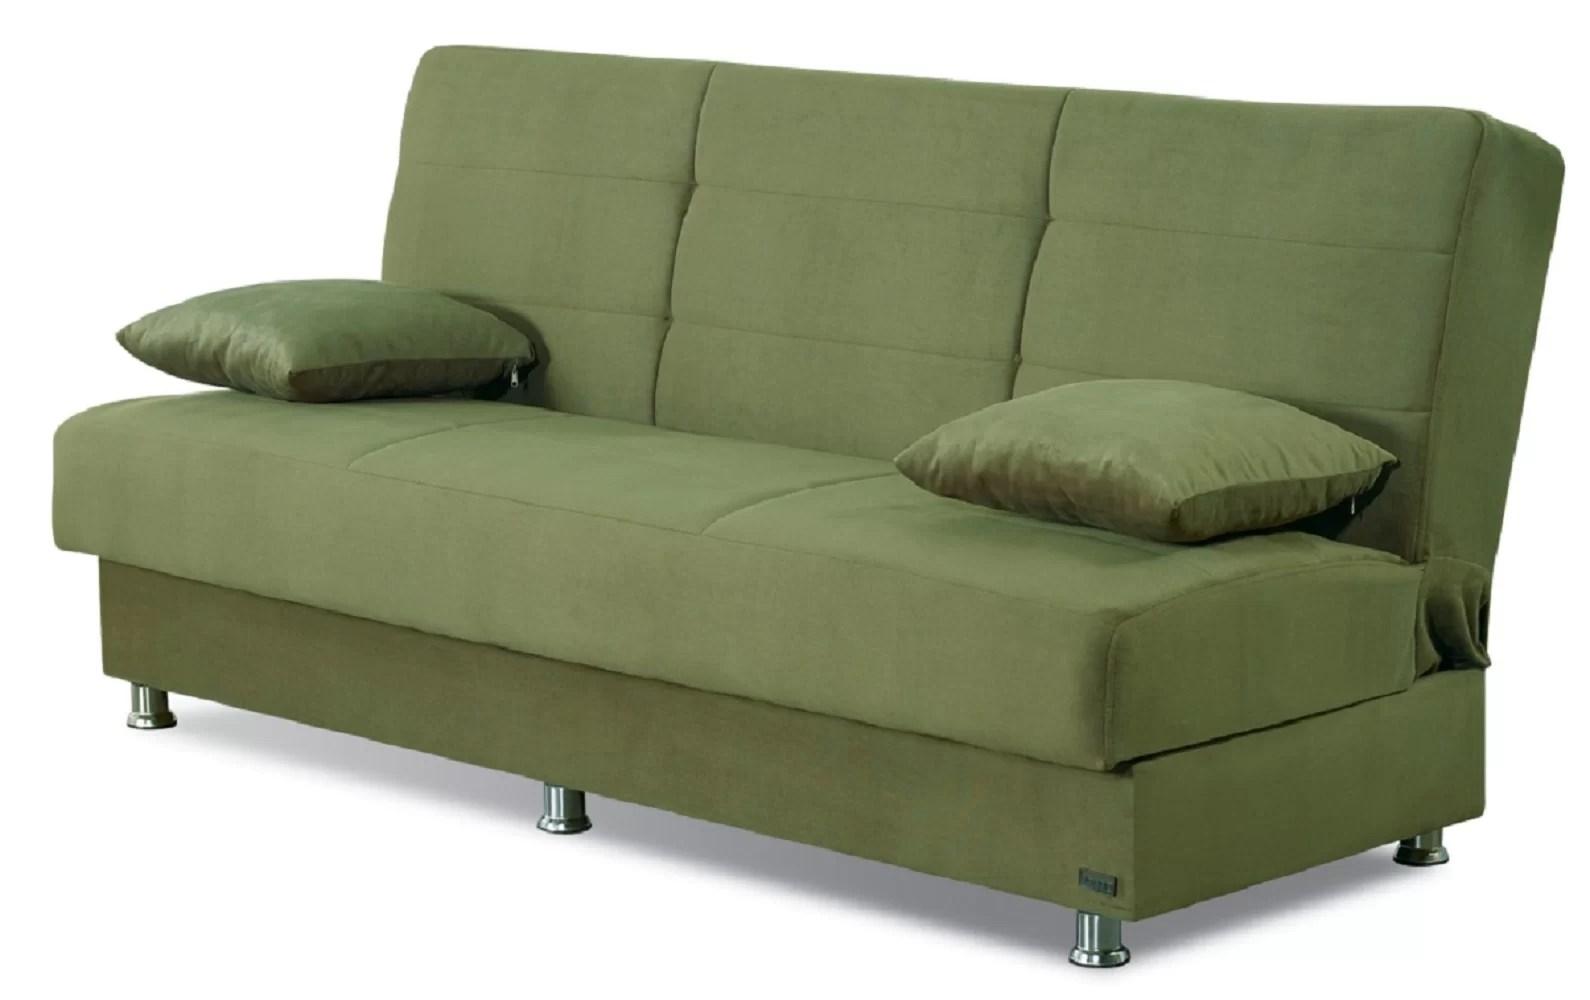 Winston Porter Brookhurst 75 Armless Sleeper Sofa Bed Reviews